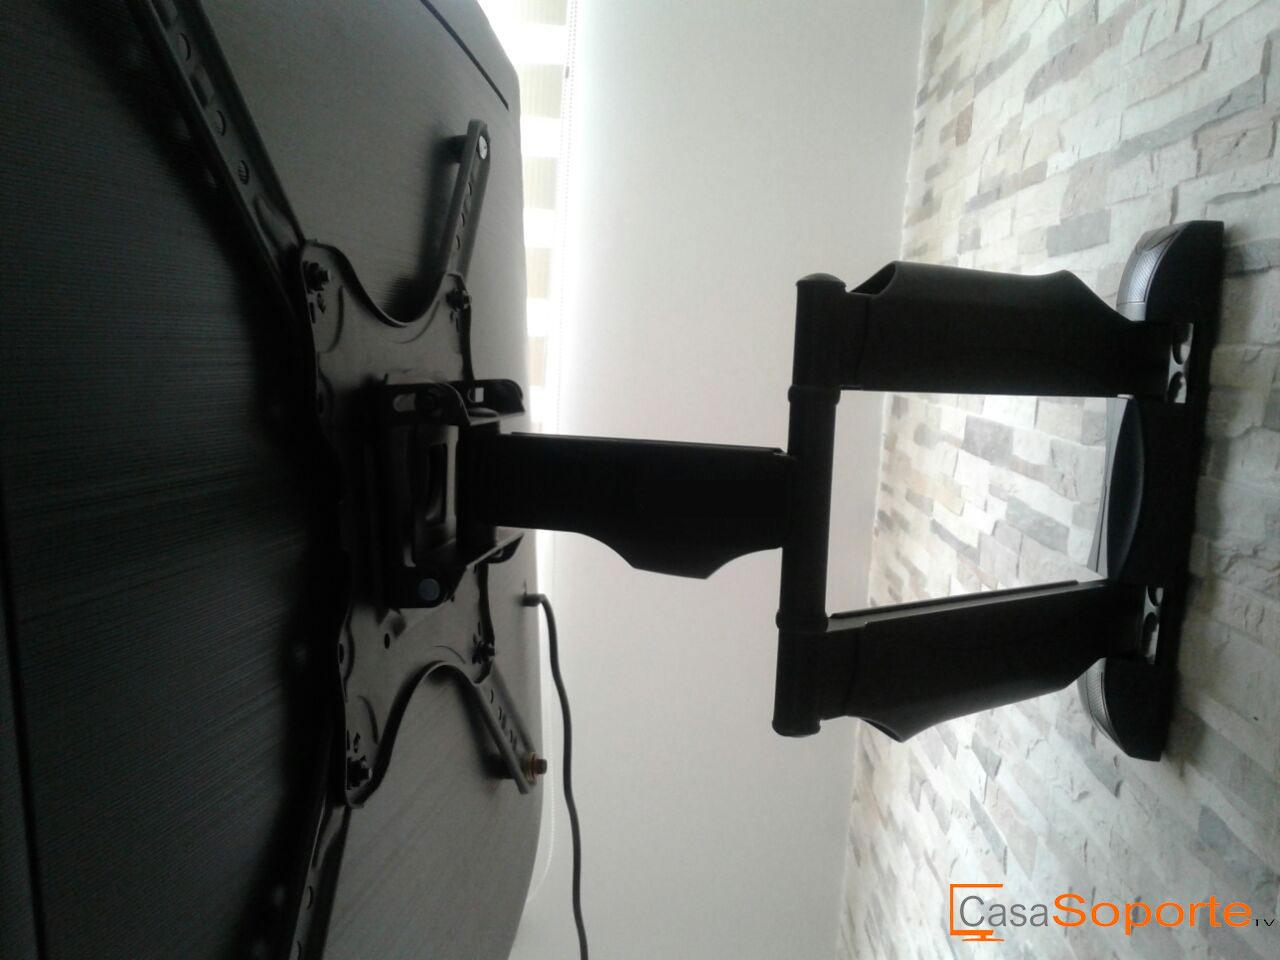 Instalacion de soporte de brazo para telervisor samsung 40 - Distancia televisor 55 pulgadas ...